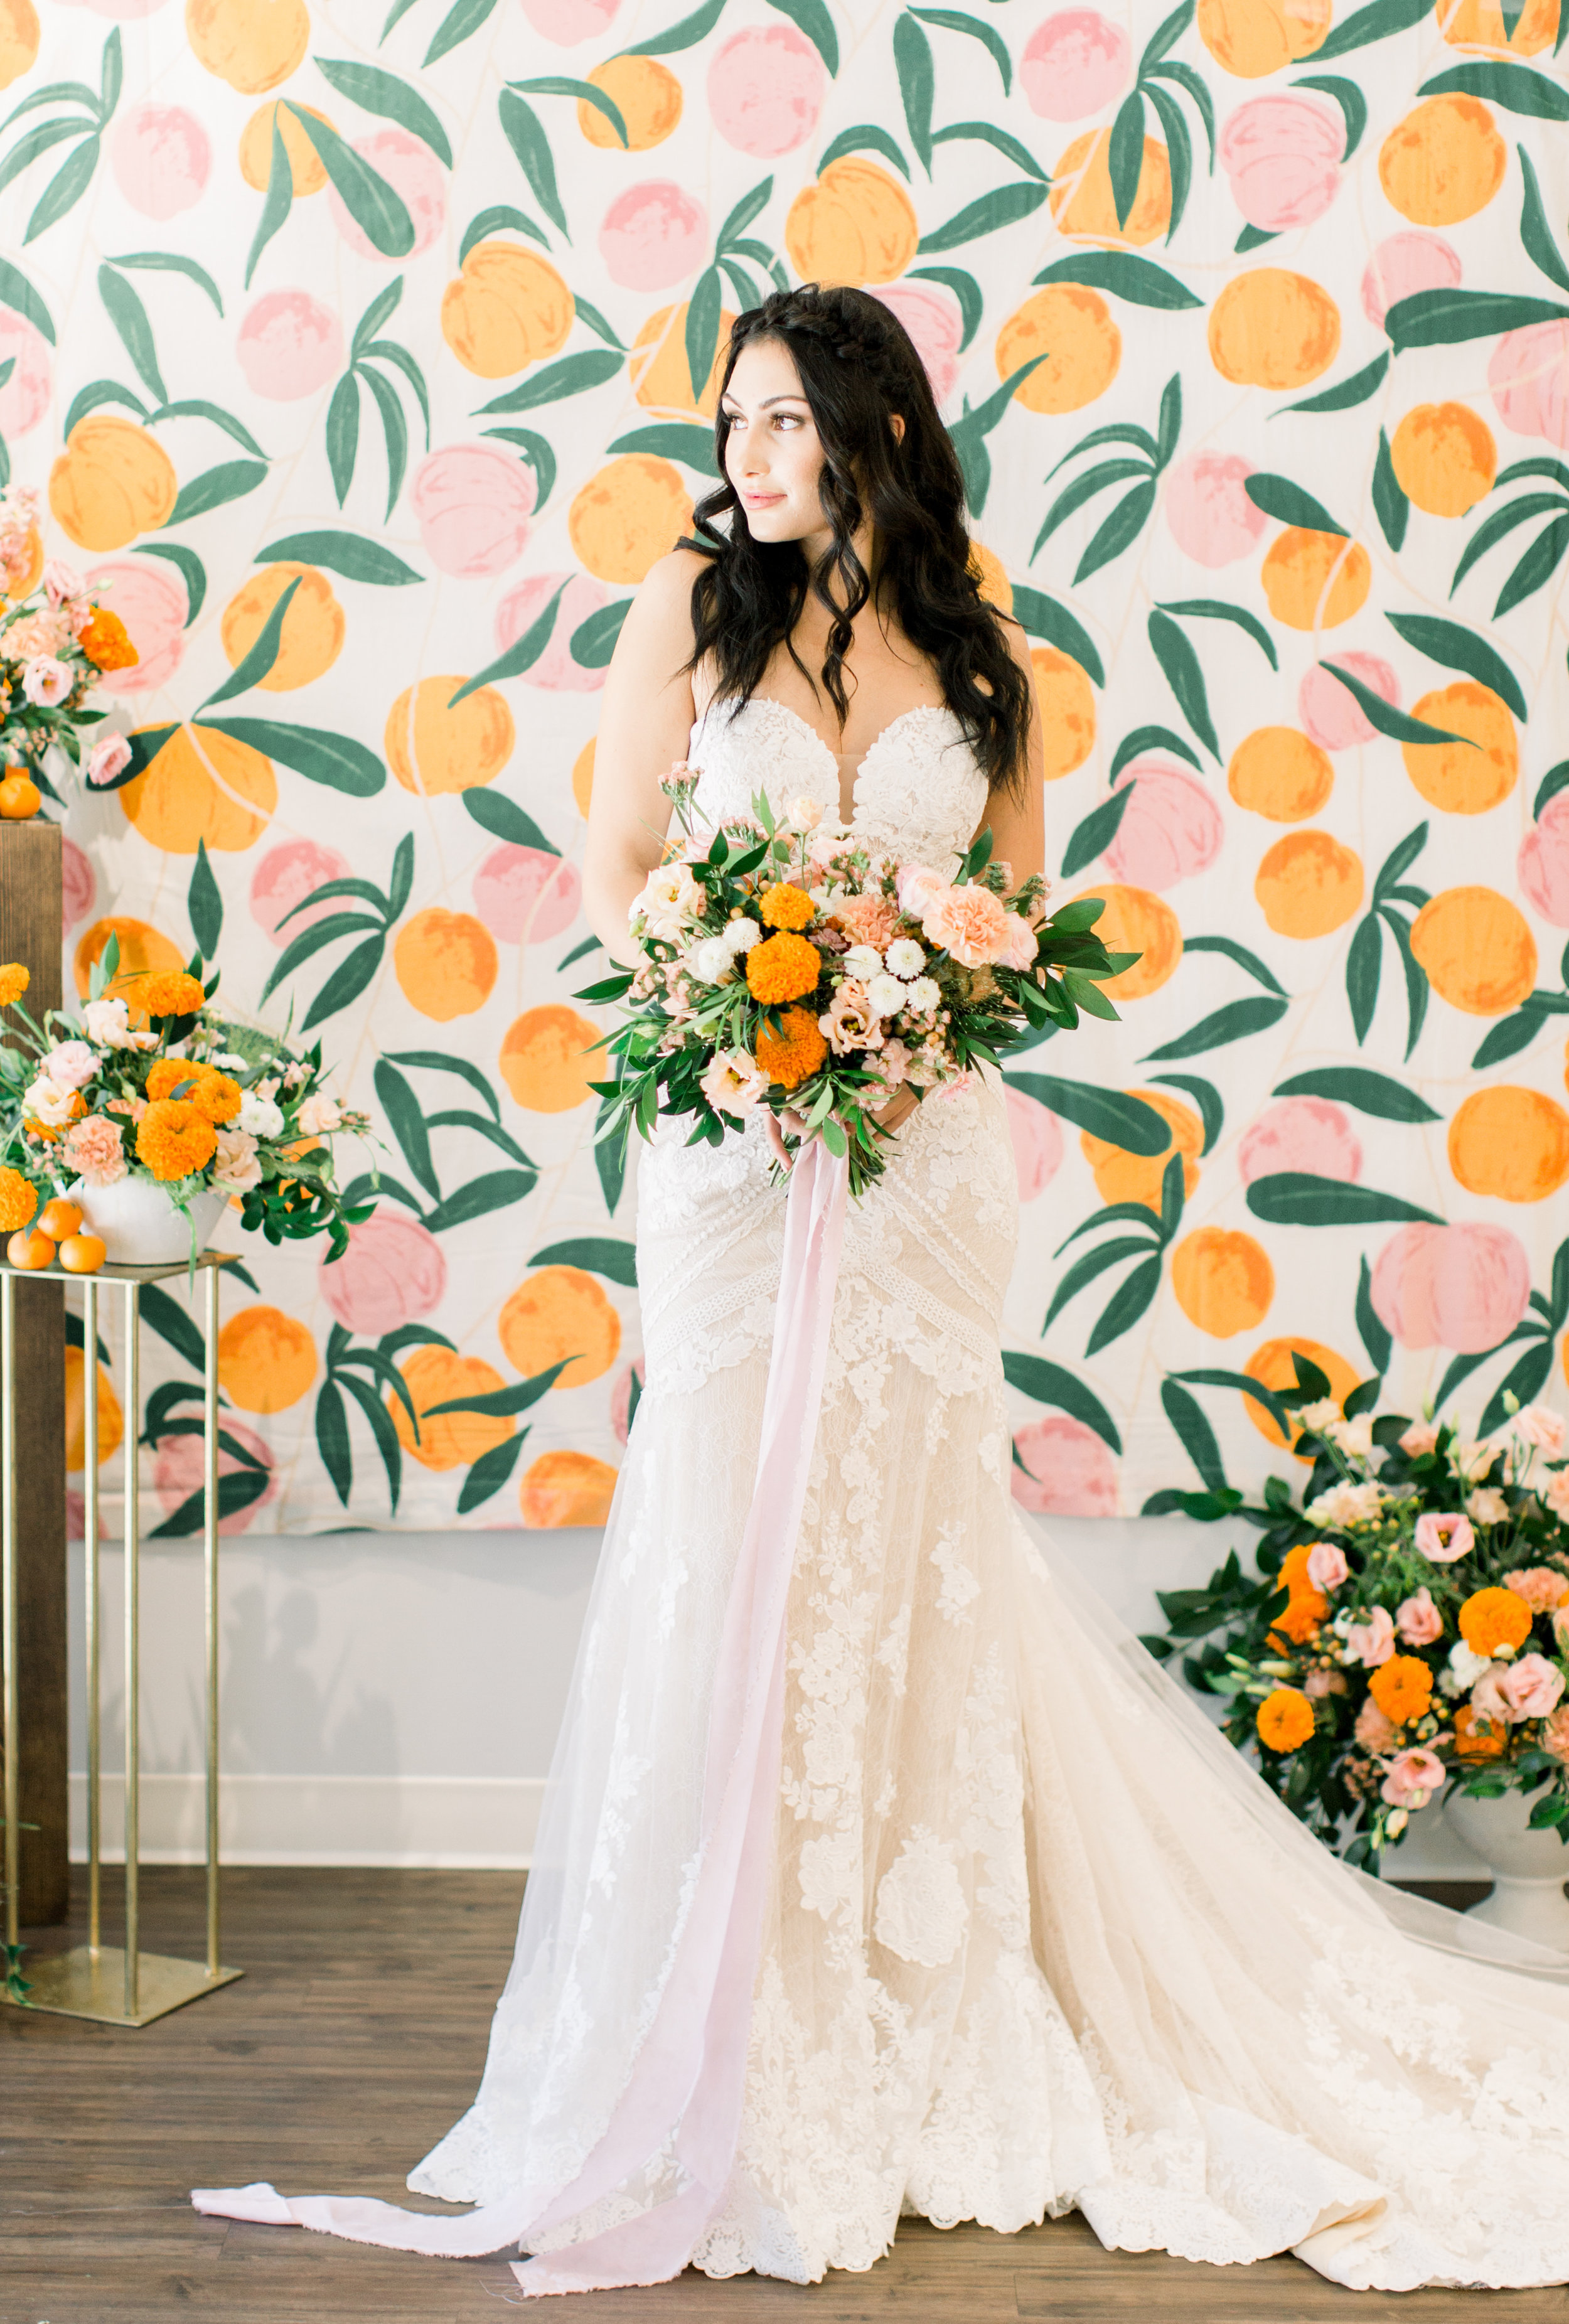 Bridal Gown Lookbook - Arizona florist Phoenix Scottsdale Sedona - Citrus Inspired Wedding Colors